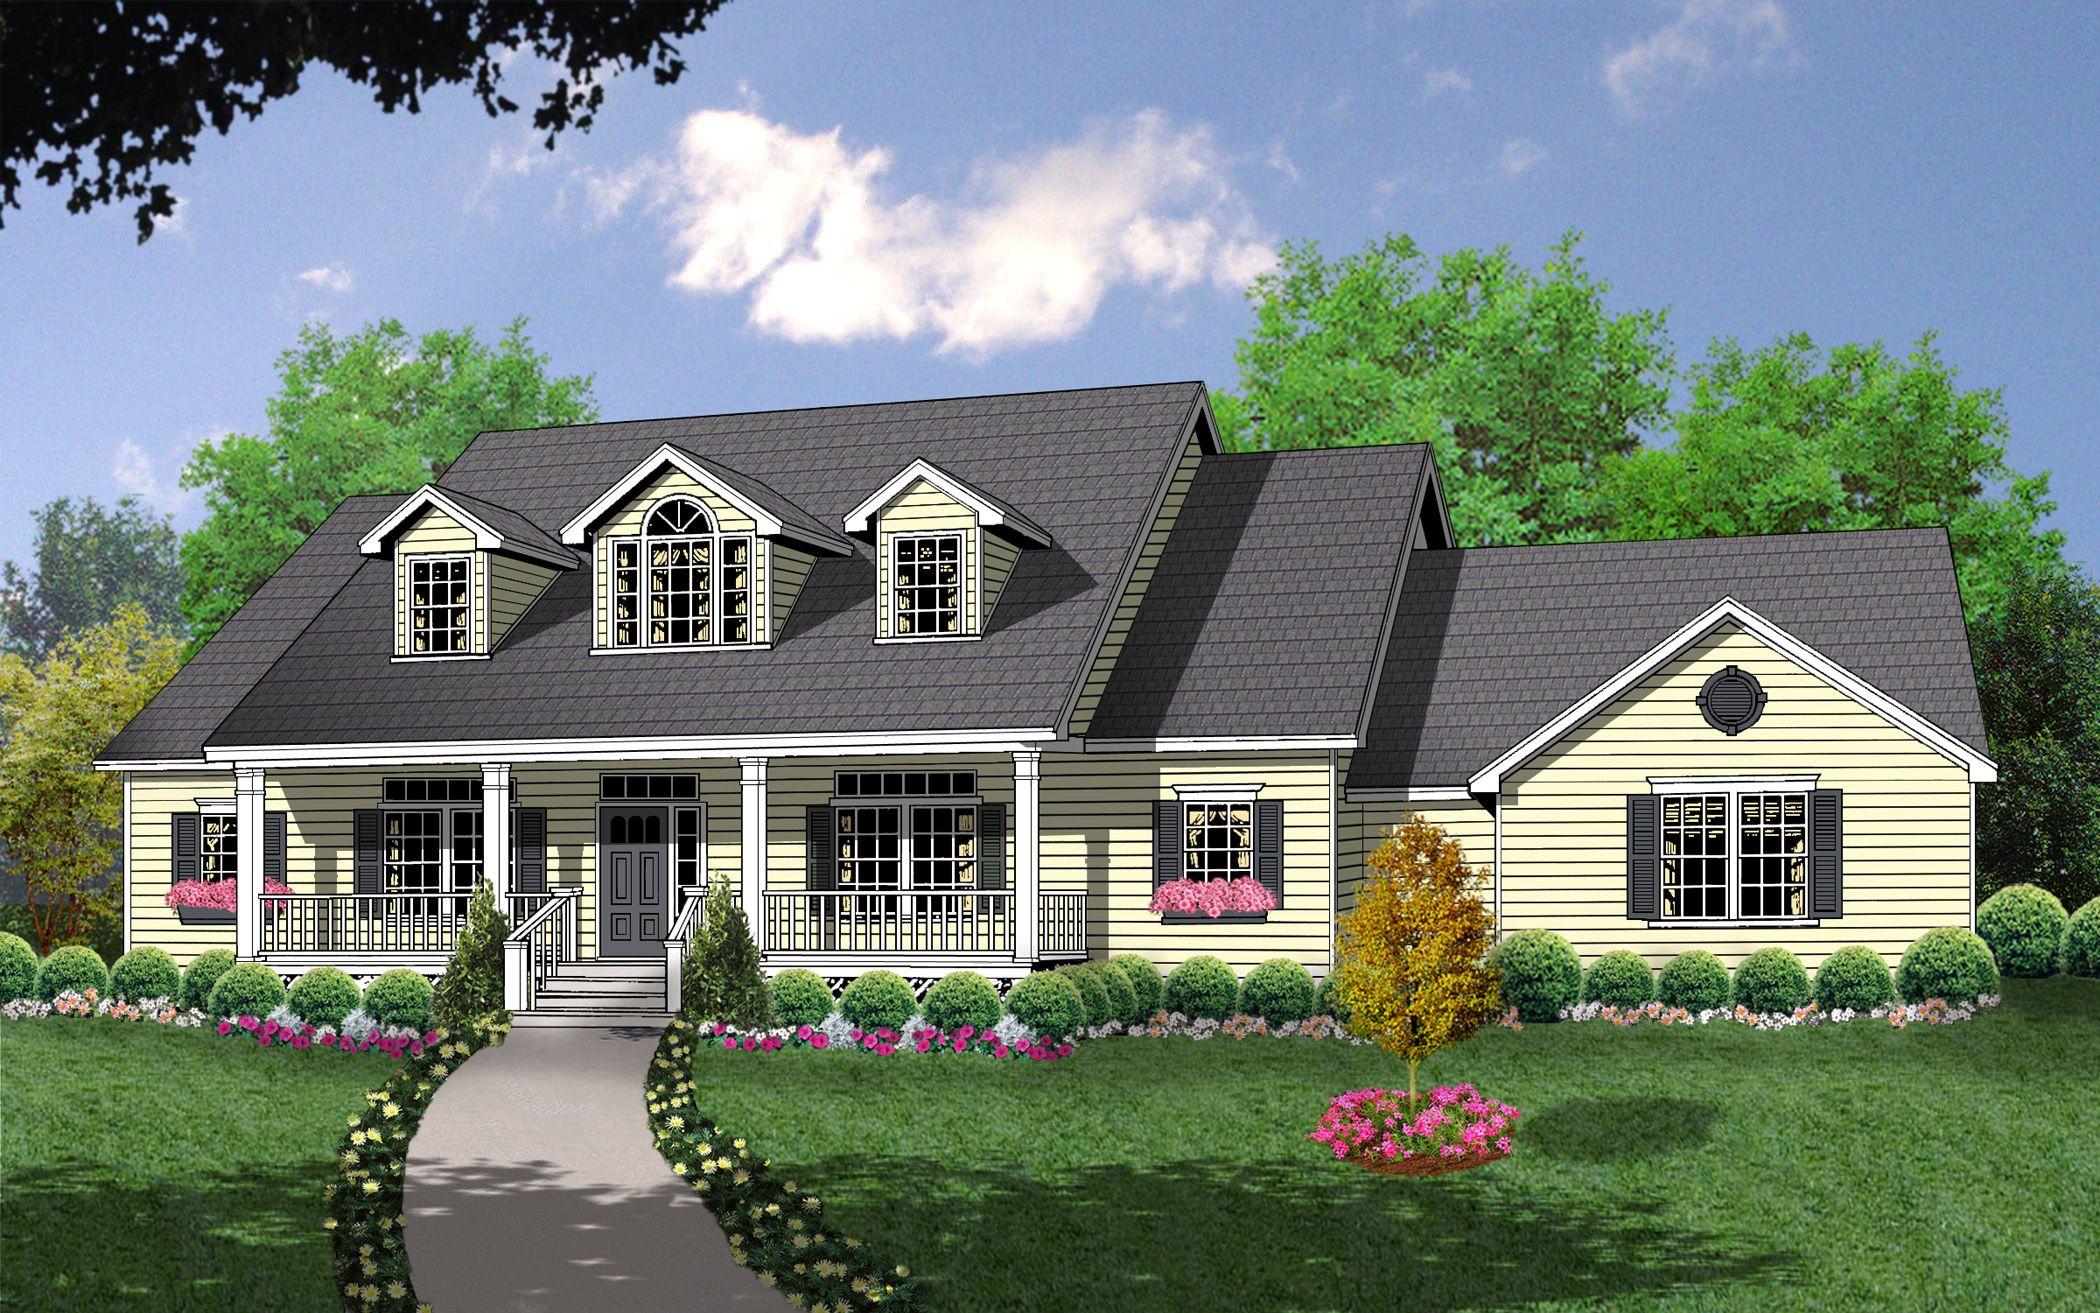 Plan 7423rd Bonus Space Over Side Entry Garage In 2021 Country Style House Plans Country House Plans House Plans Farmhouse